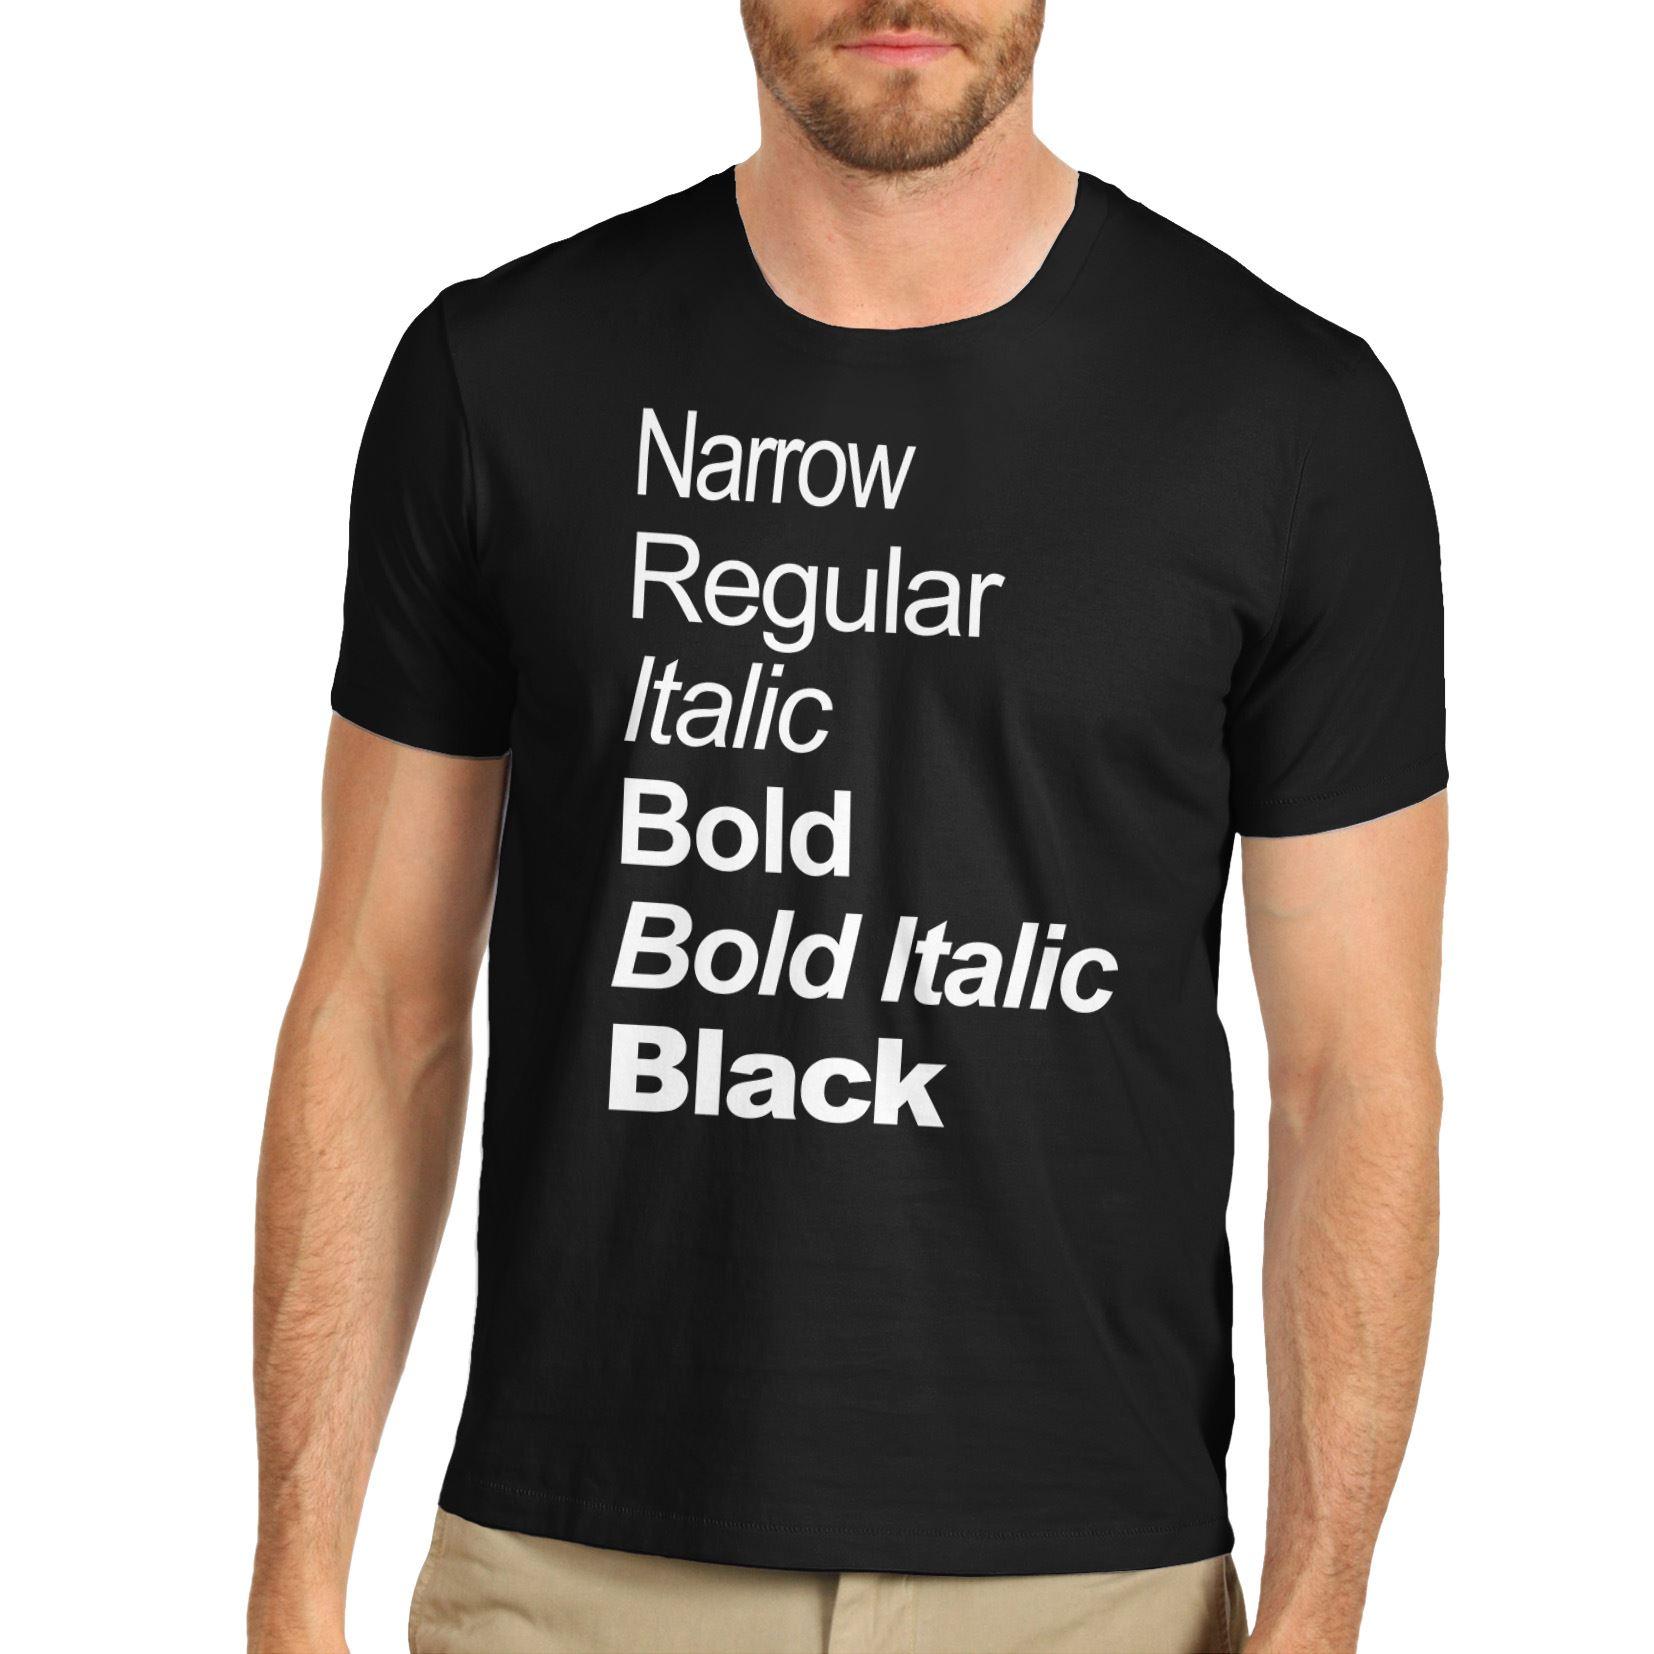 Black t shirt bulk - Bulk T Shirts Crew Neck New Style Cotton Gift Design Regular Italic Bold Theme Fronts Black